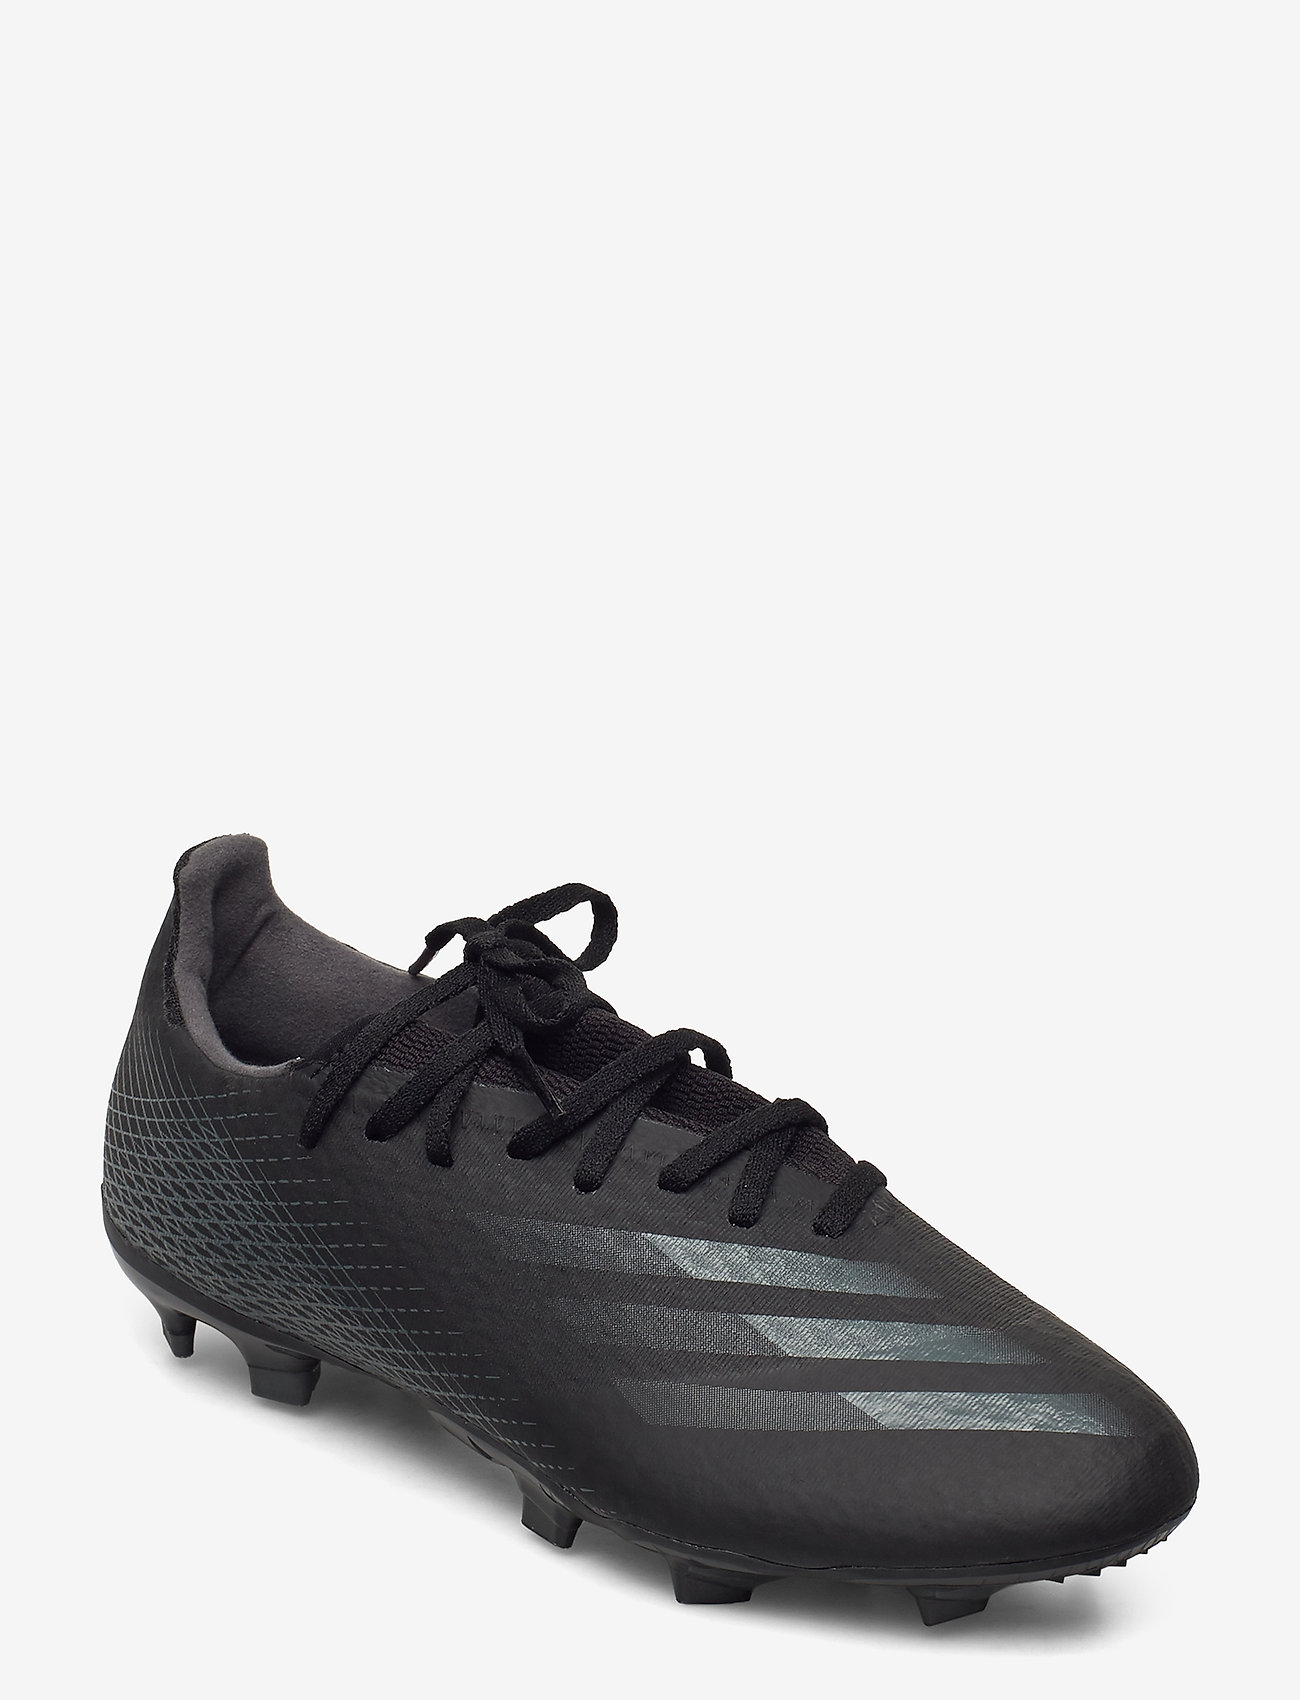 adidas Performance - X GHOSTED.3 FG - fotbollsskor - cblack/cblack/gresix - 0